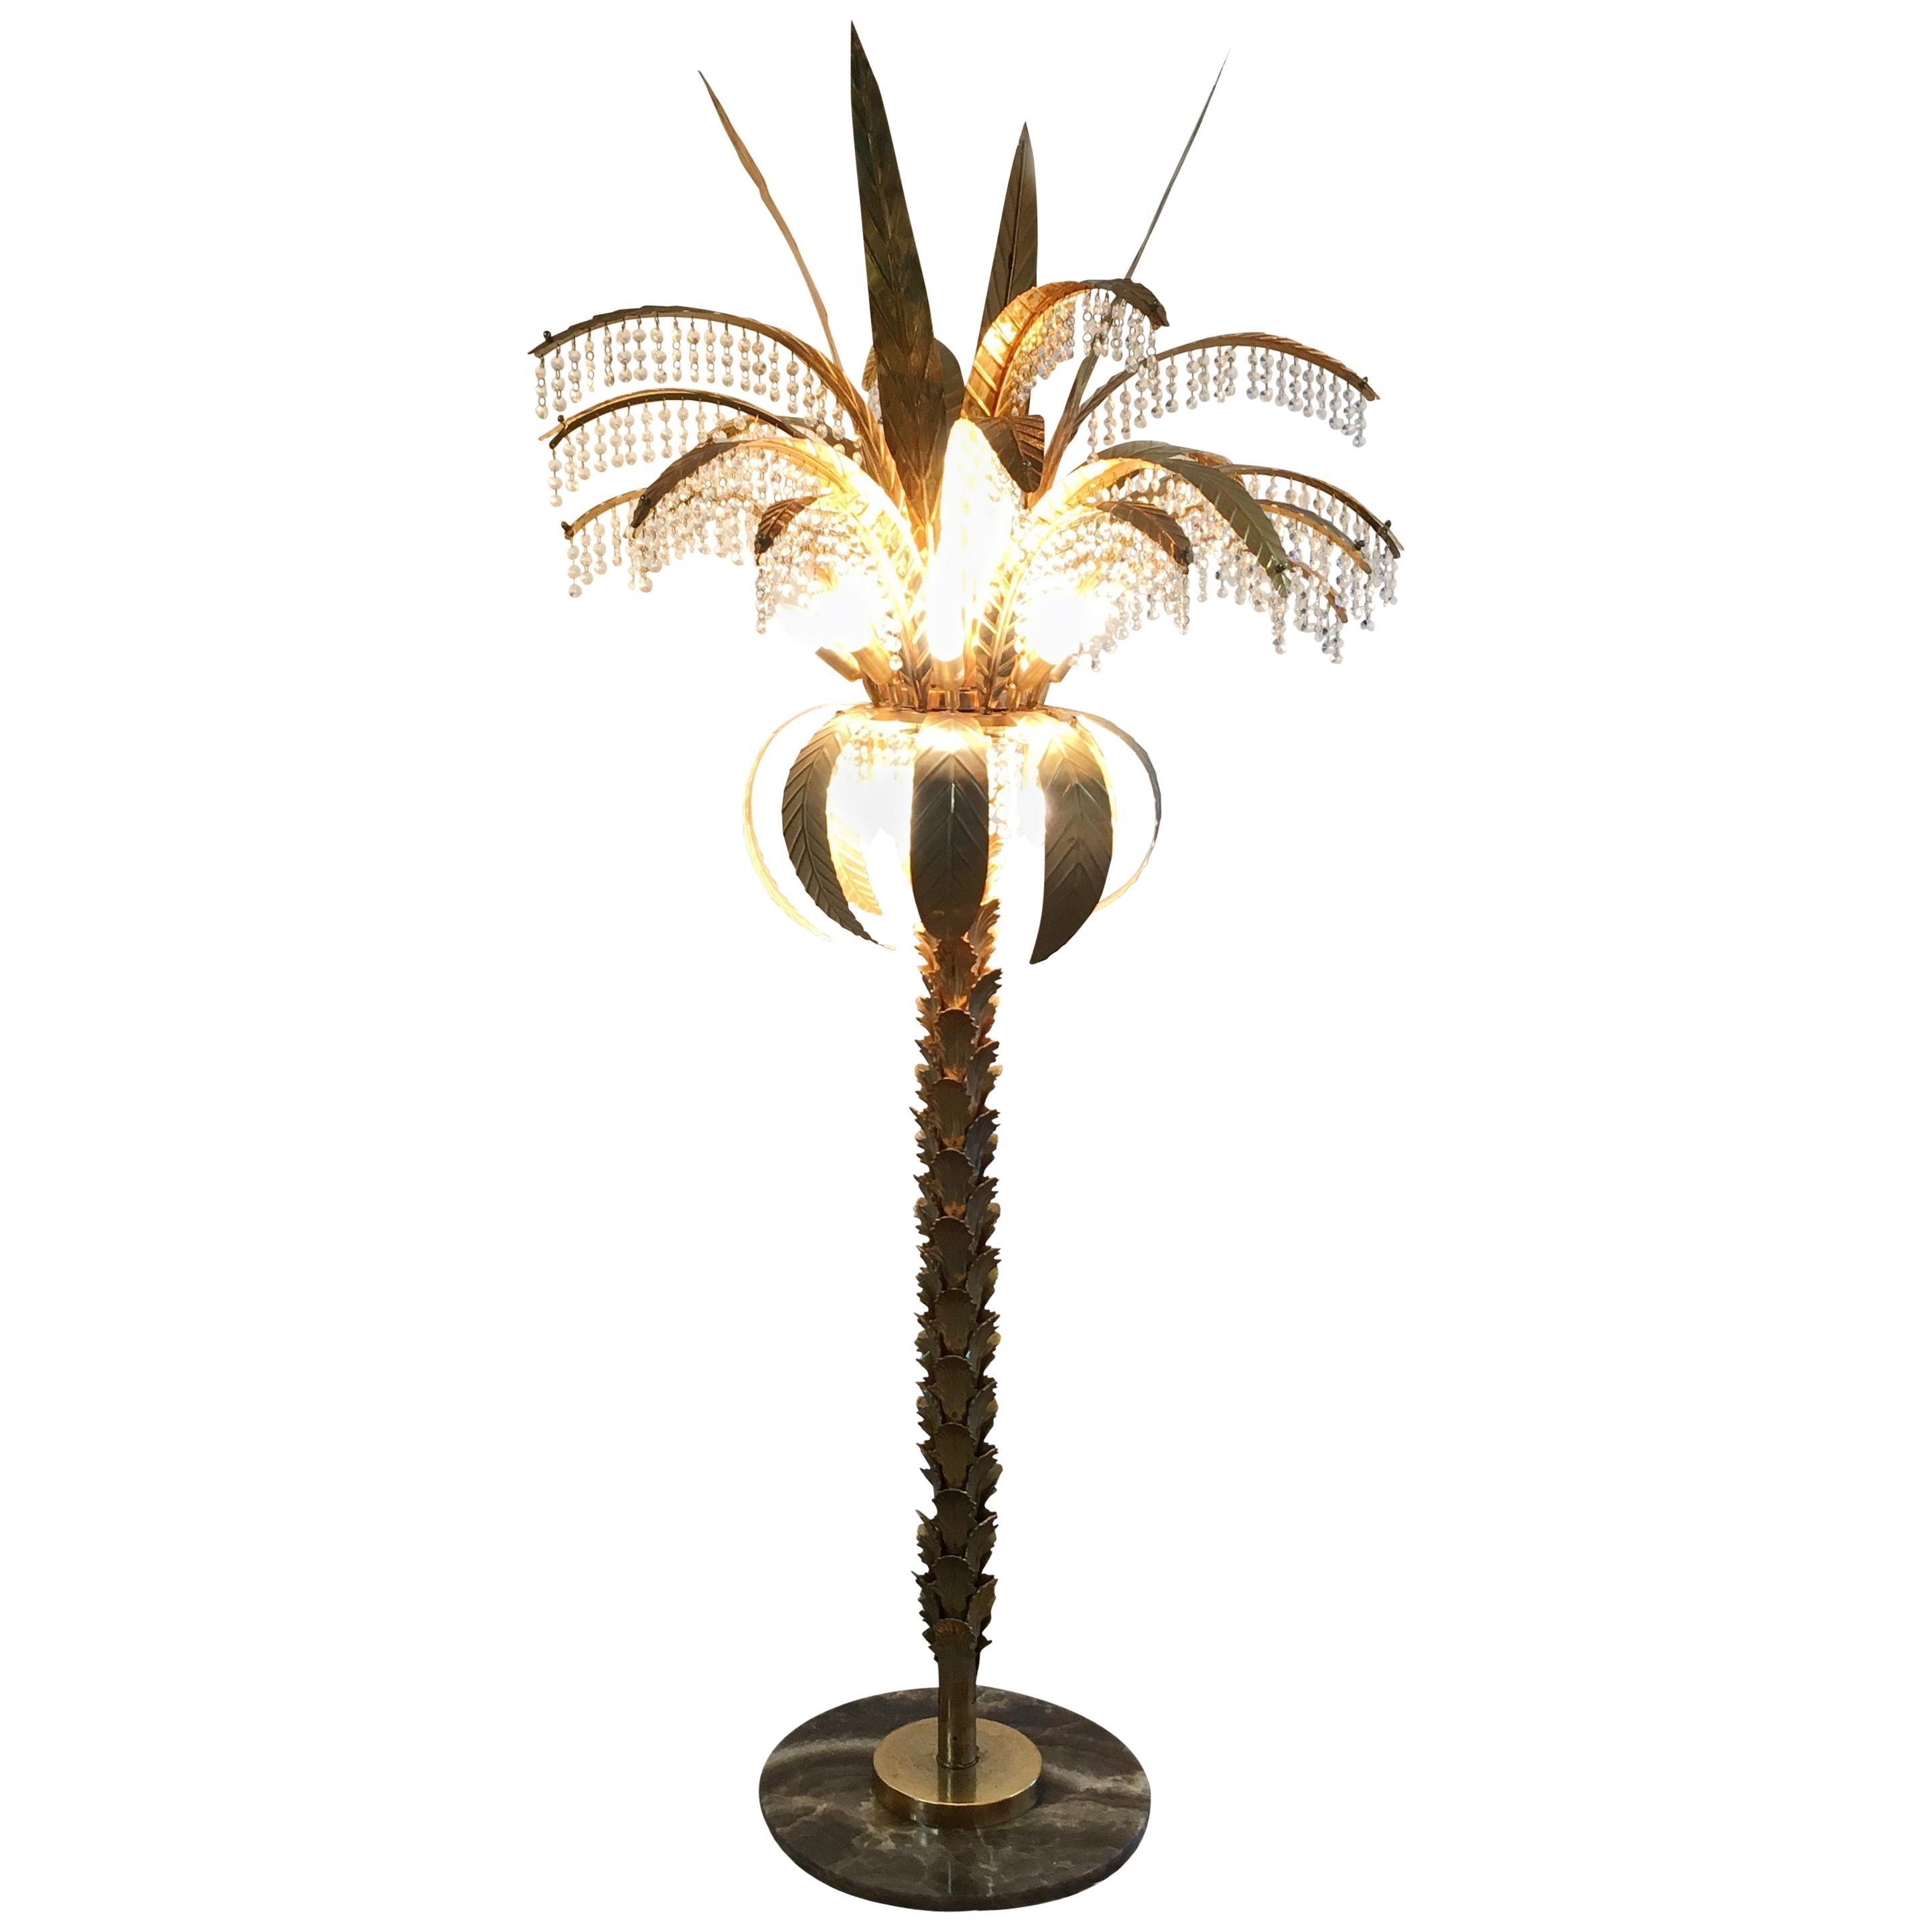 1980s Gilt Crystal Palm Tree Floor Lamp